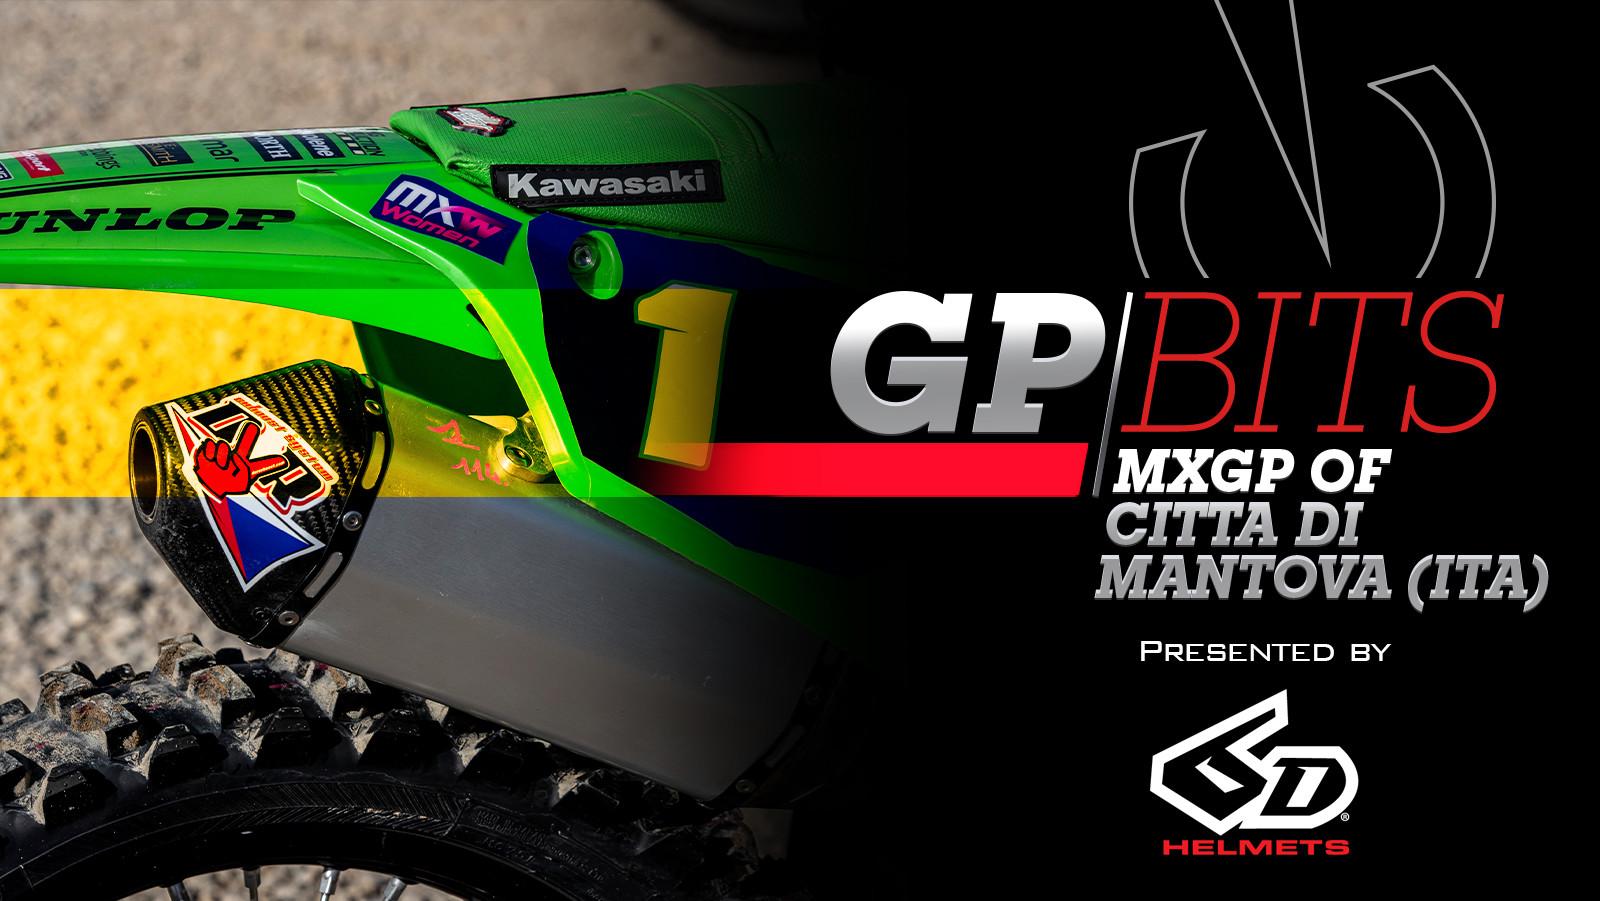 GP Bits: MXGP of Citta di Mantova | Round 10